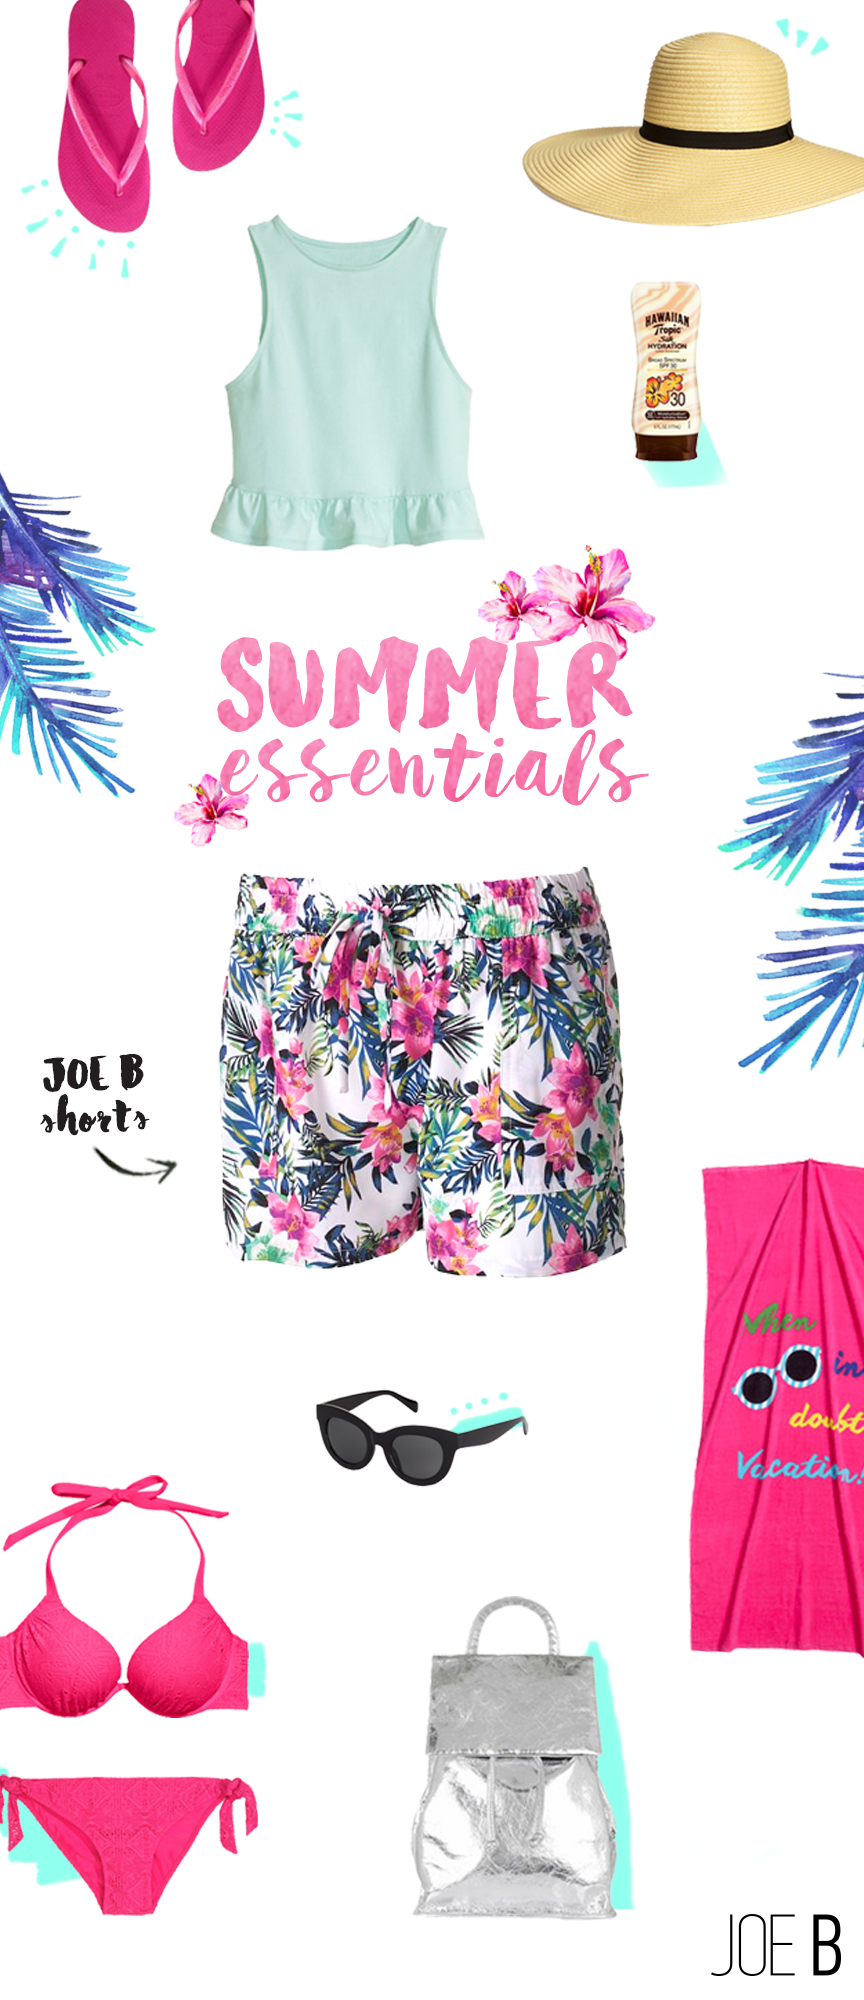 Juniors Joe B Soft Challis Shorts Fashion Clothes Summer Essentials